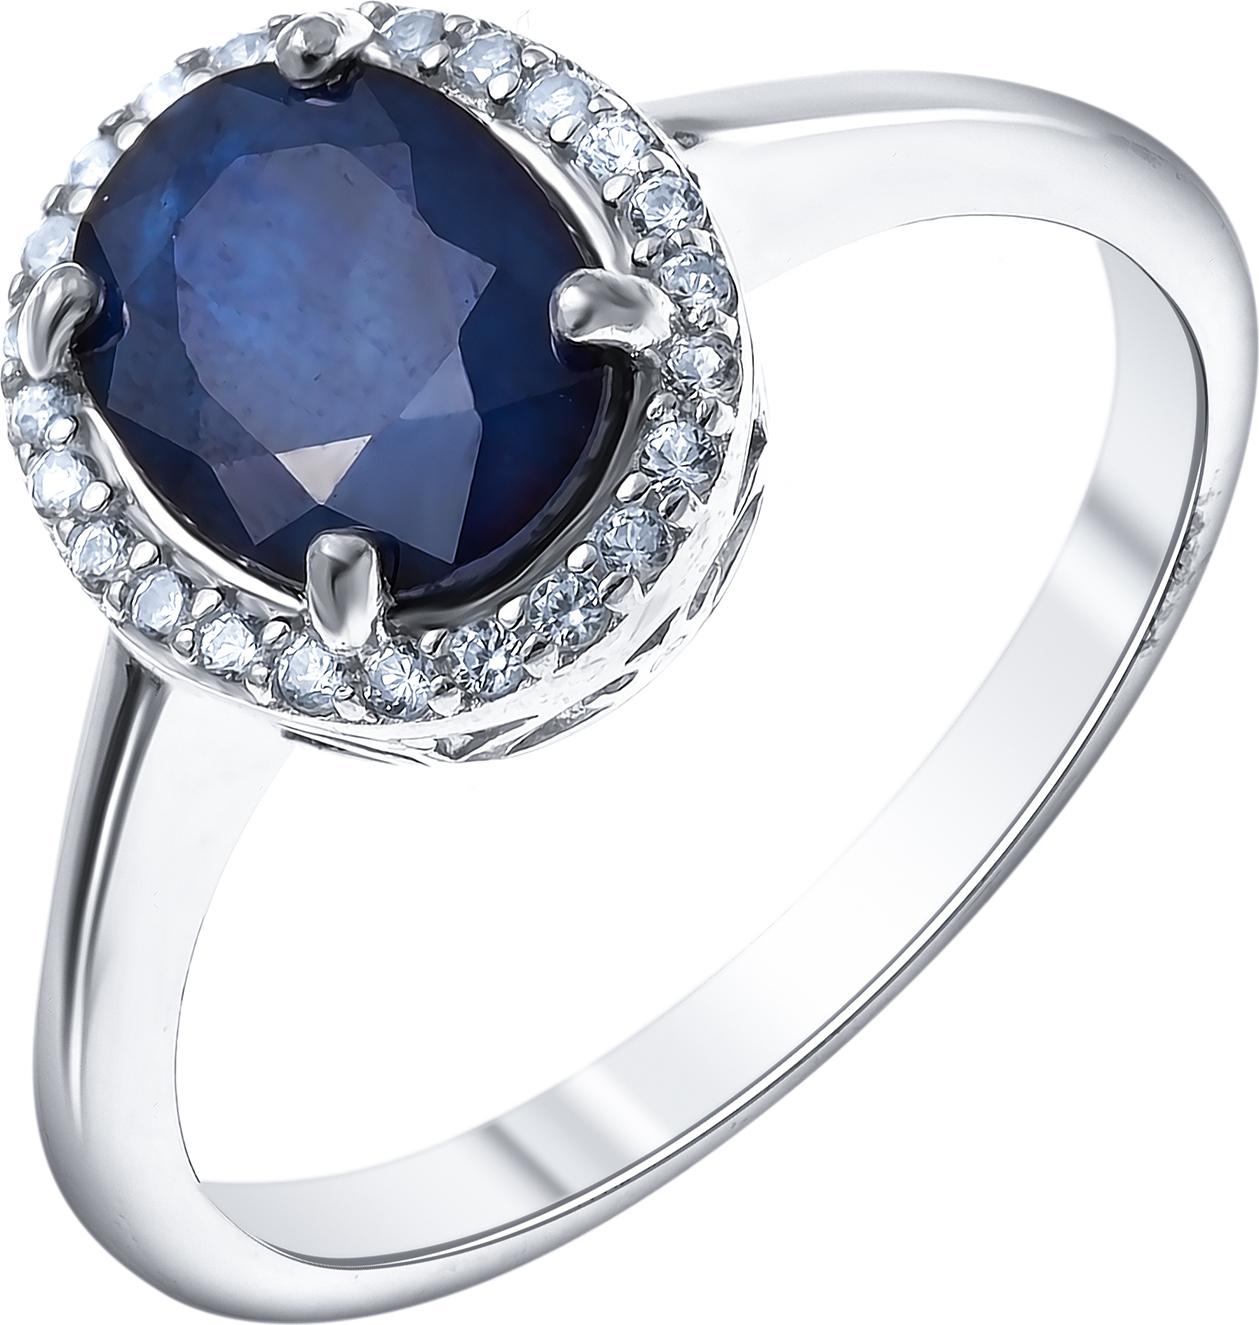 костроме серебряное кольцо с синим камнем фото яркий